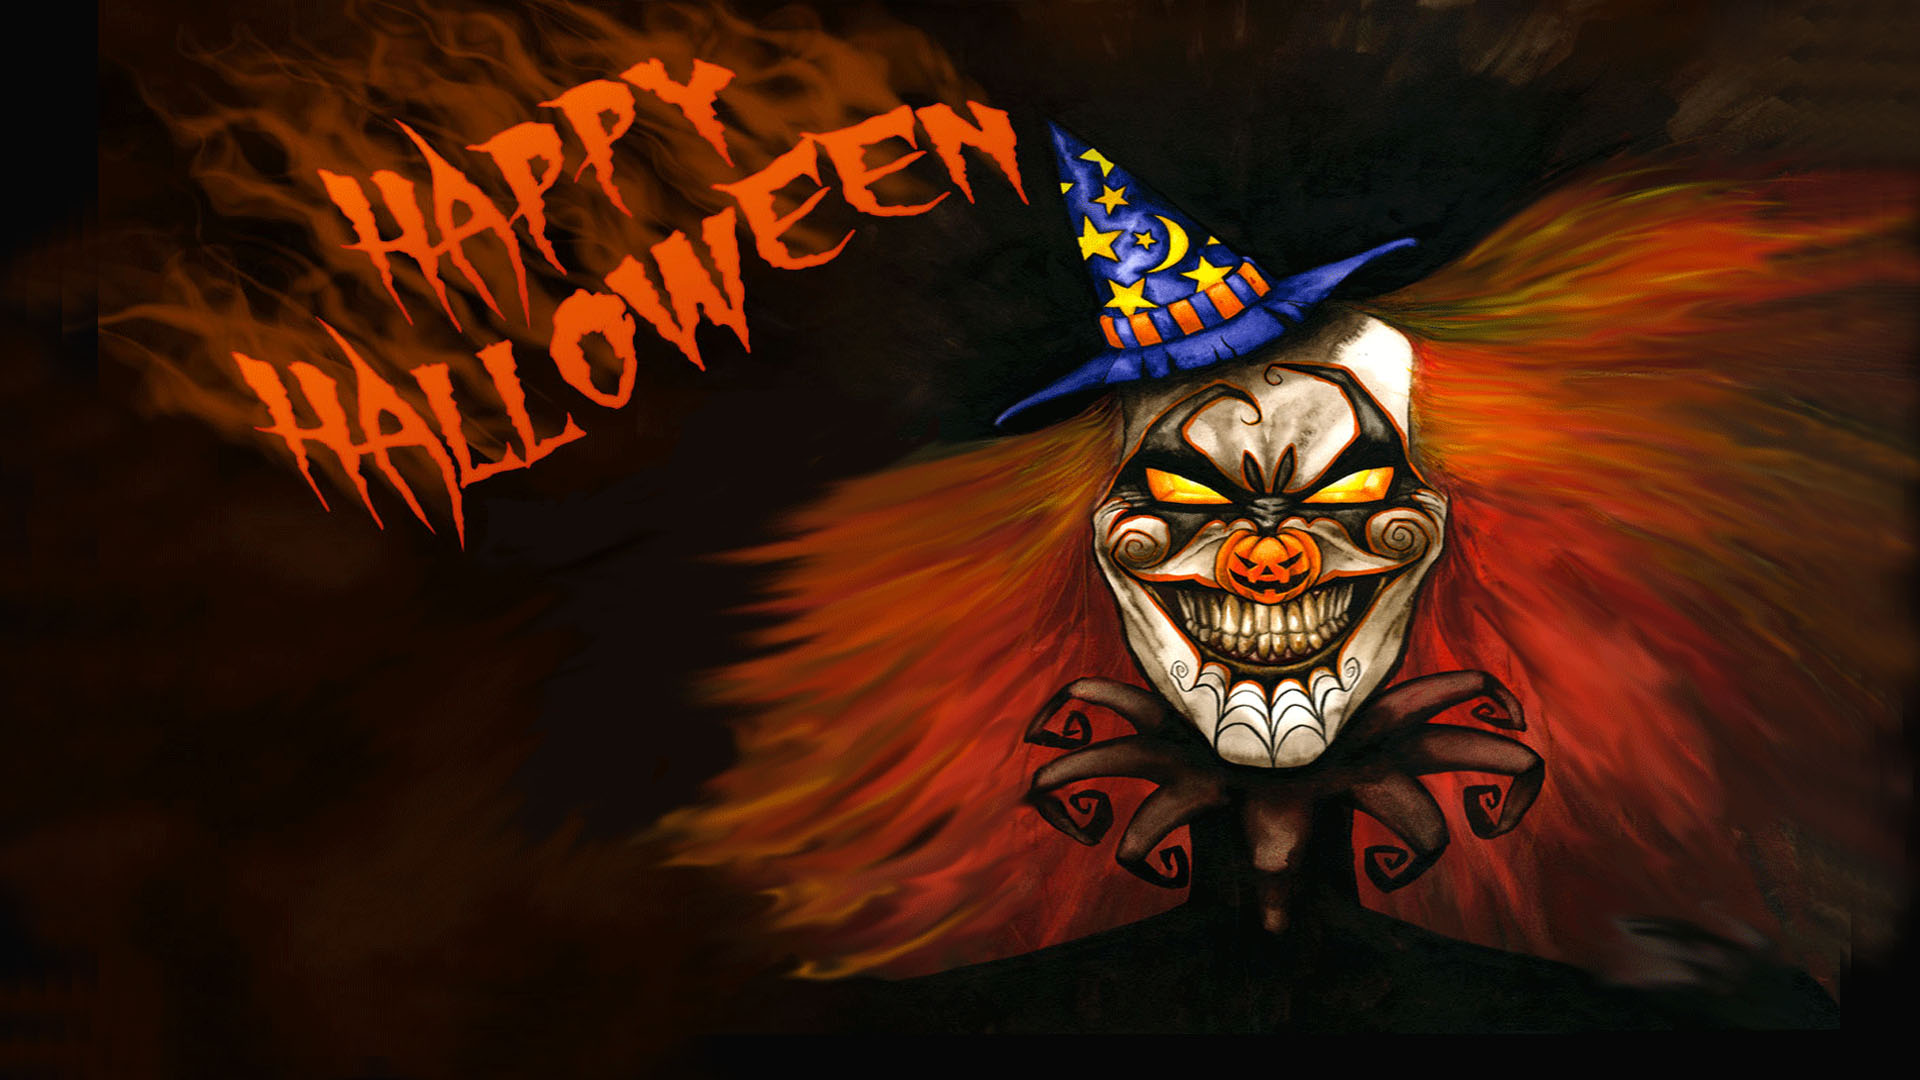 great hd halloween image